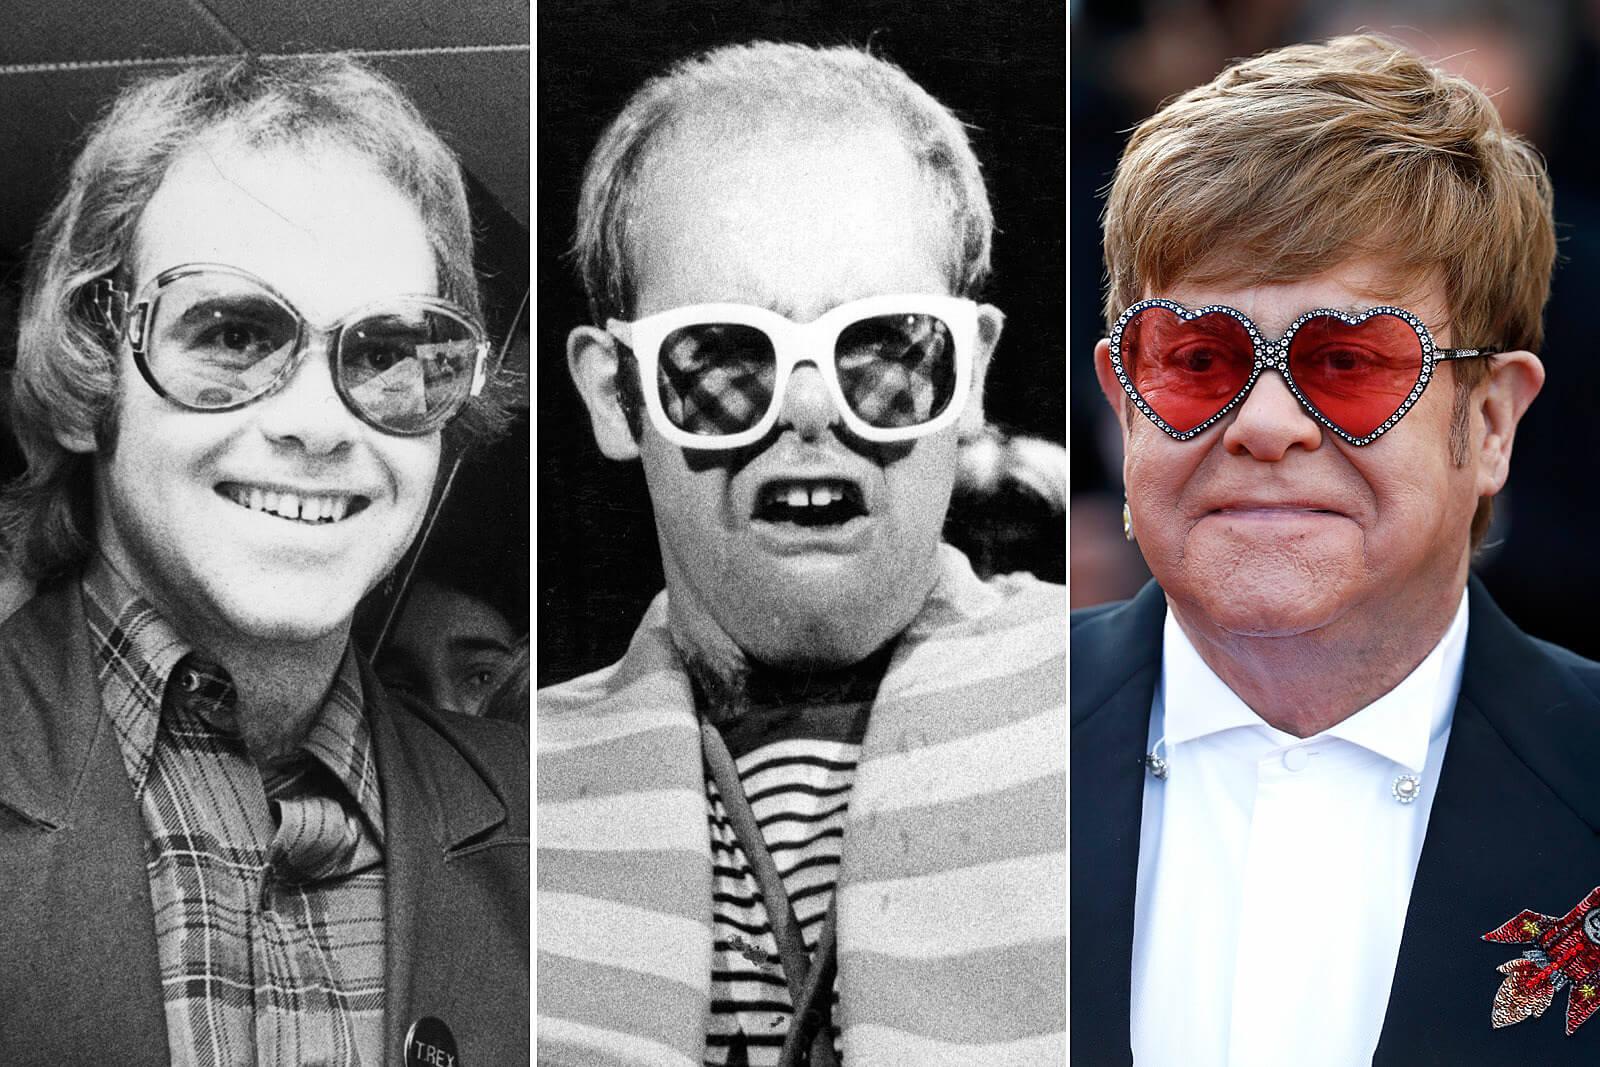 Elton John's Hair Transplant - Zty Hair Transplant Istanbul